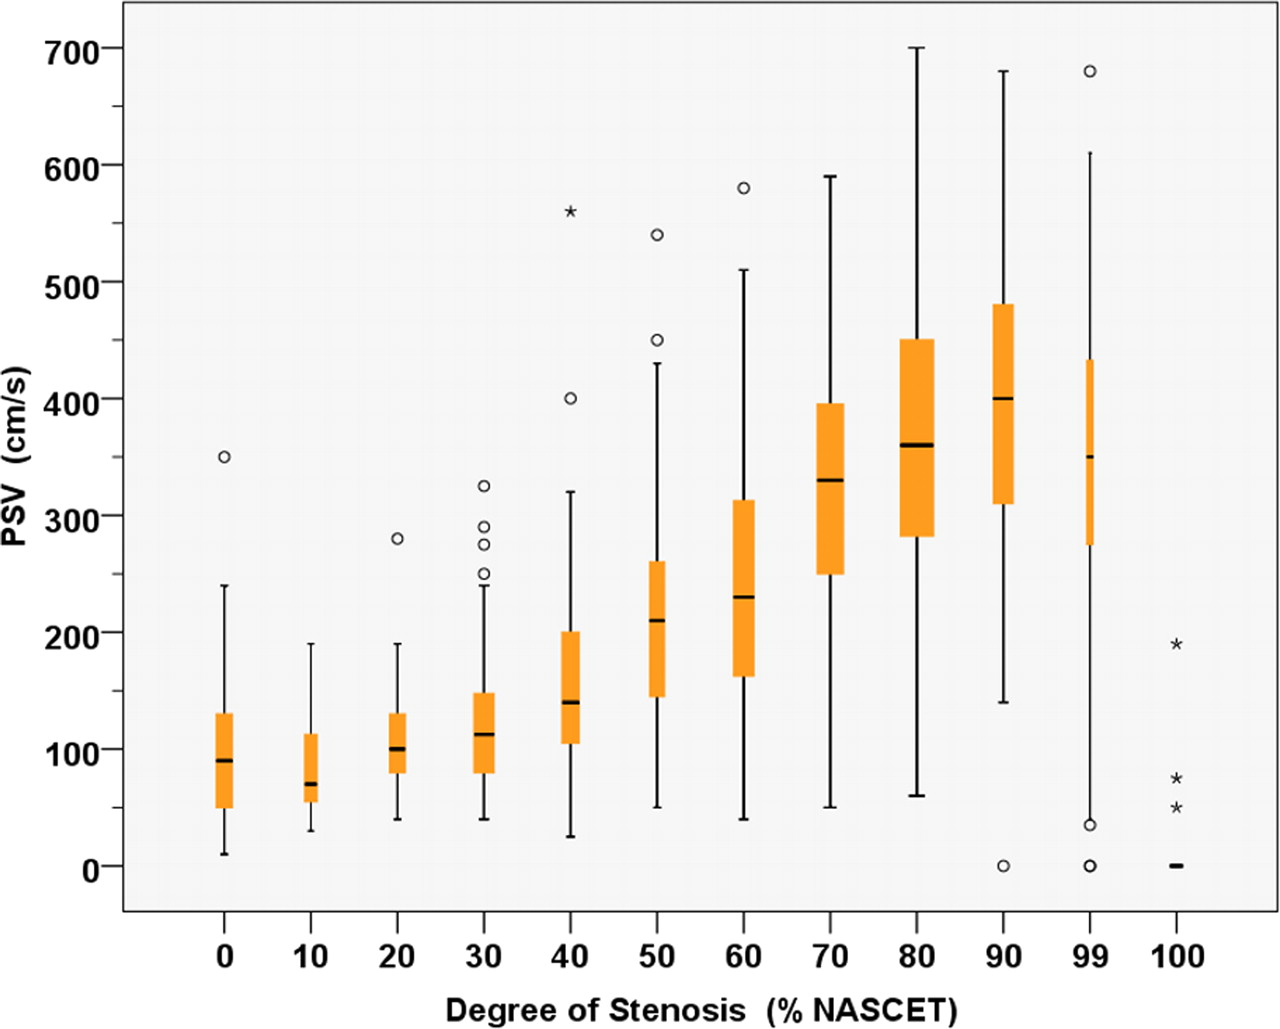 Grading Carotid Stenosis Using Ultrasonic Methods